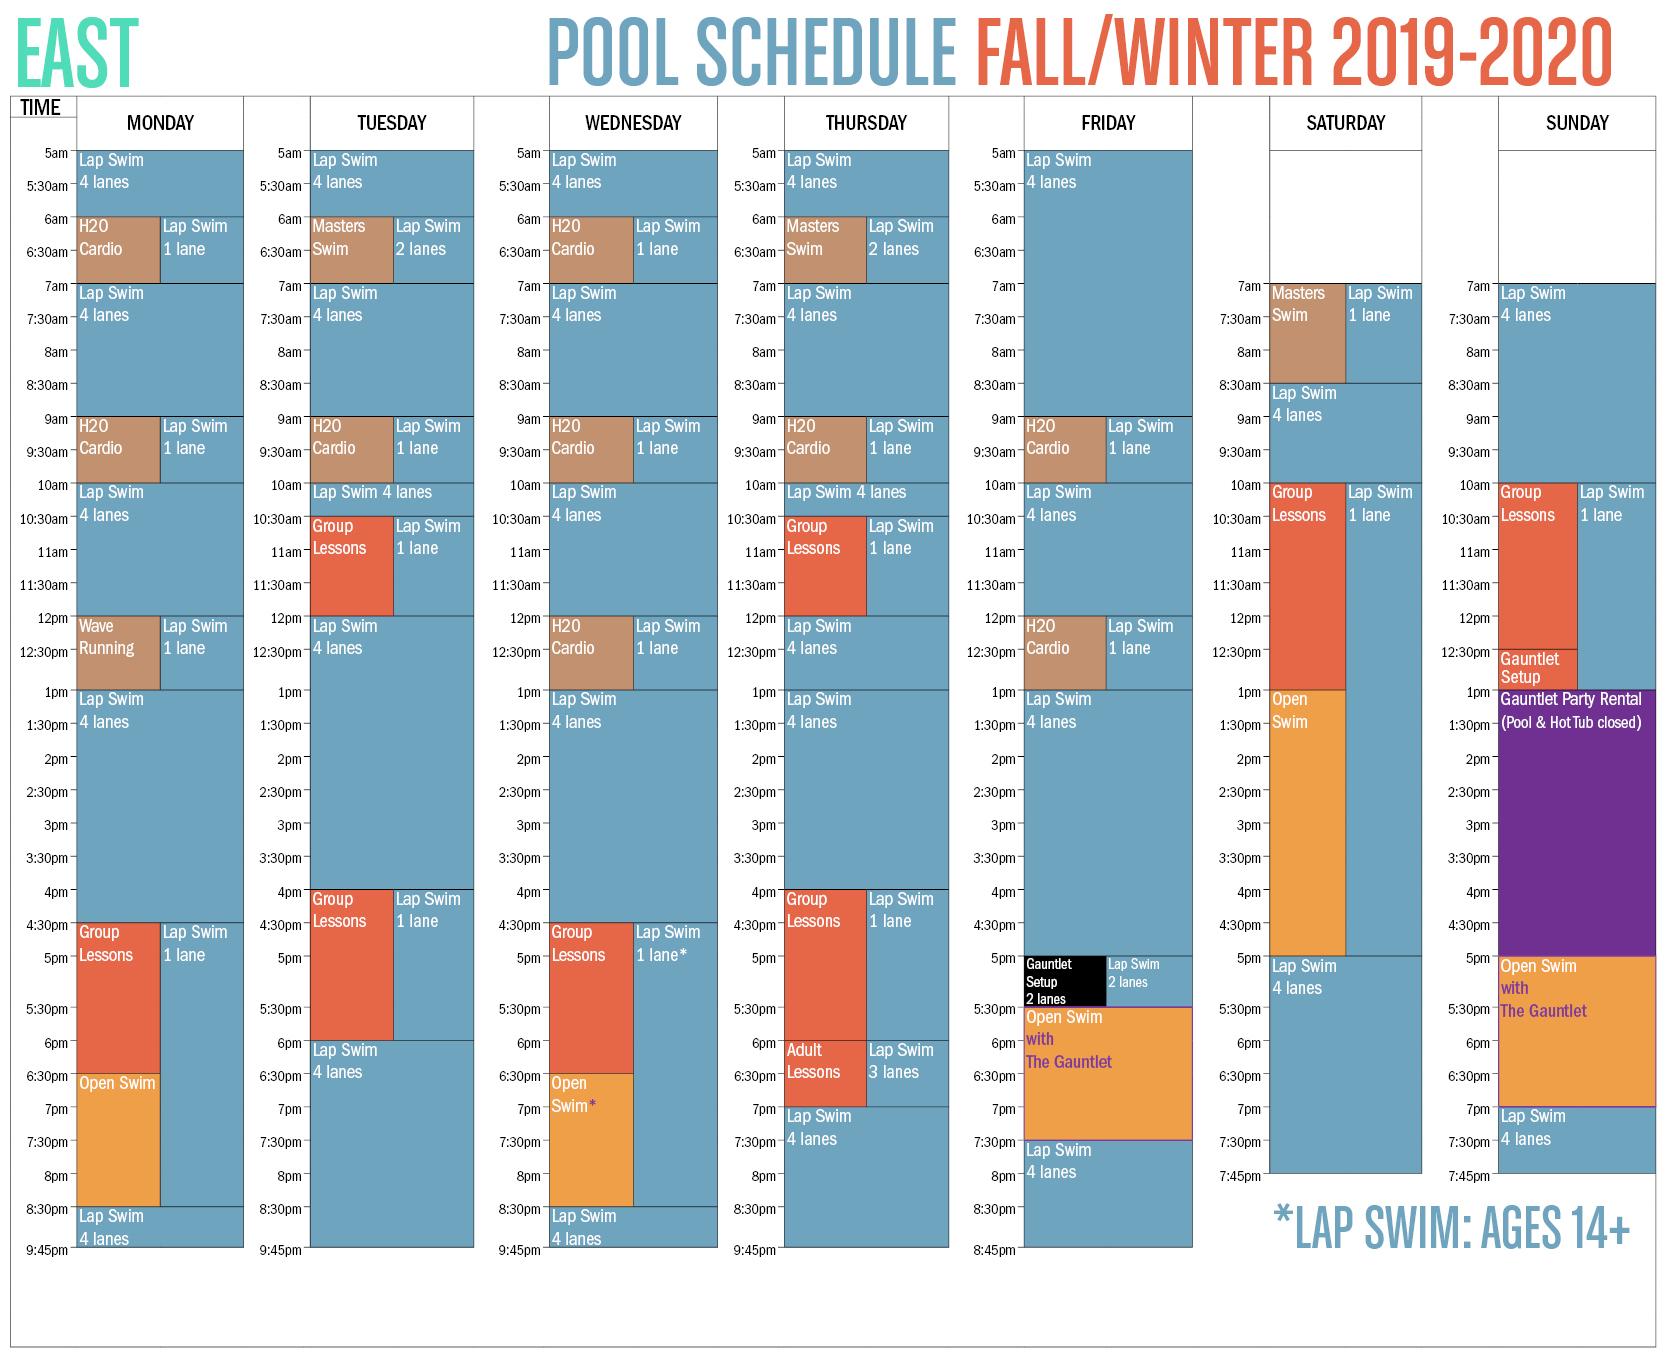 Q4-Q1 Fall-Winter East Pool Schedule [WEB]